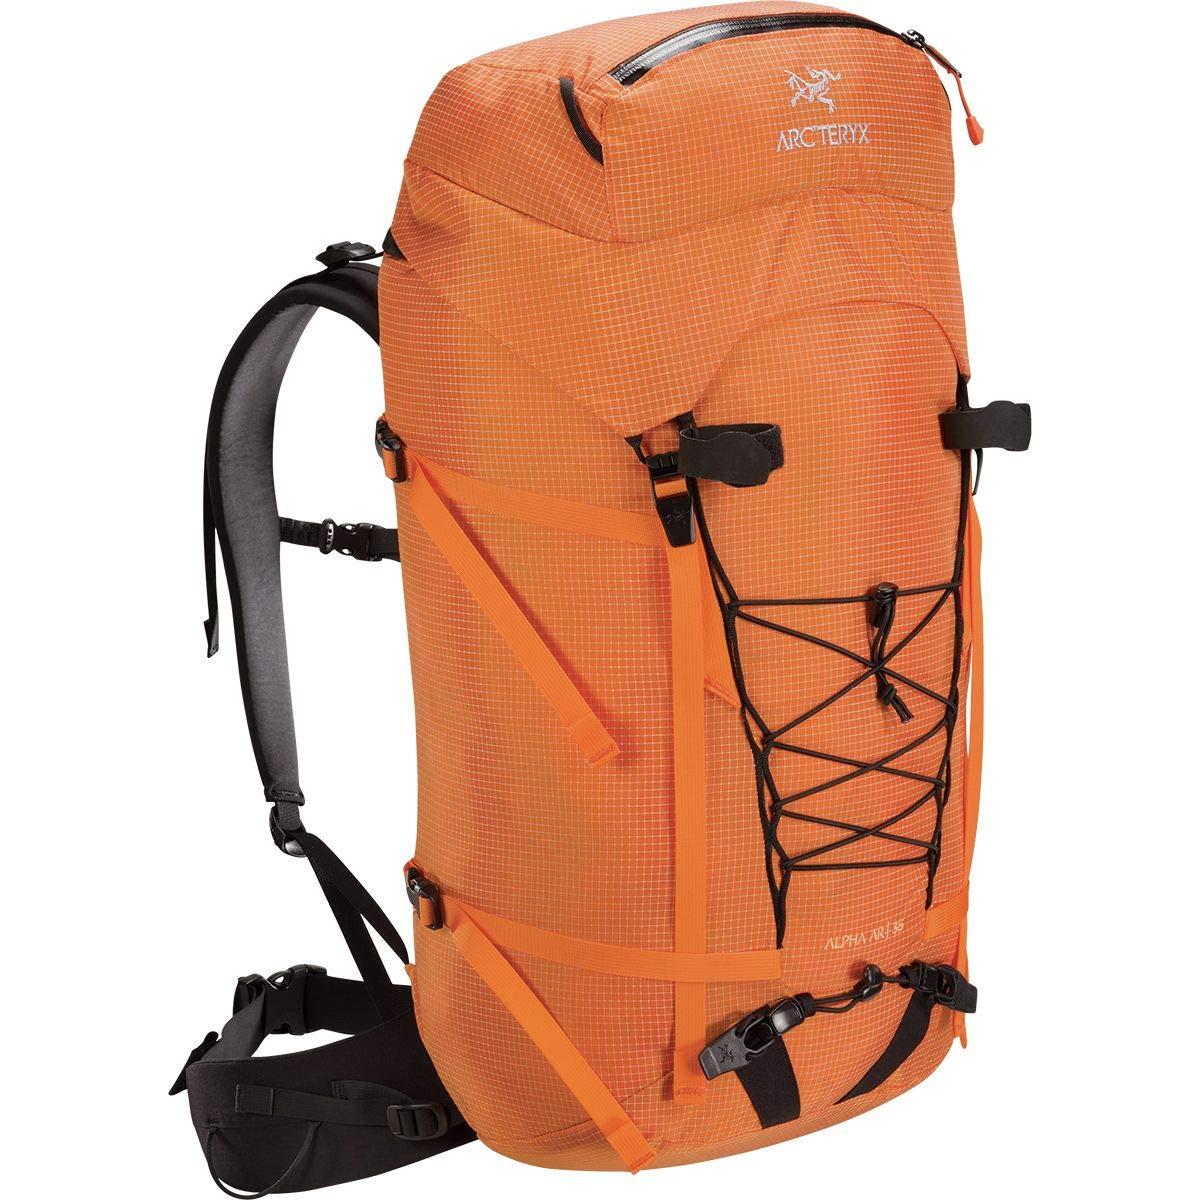 ARC'TERYX(アークテリクス) Alpha AR 35 Backpack アルファ AR 35 バックパック 20843 REG Beacon B07L37S67S